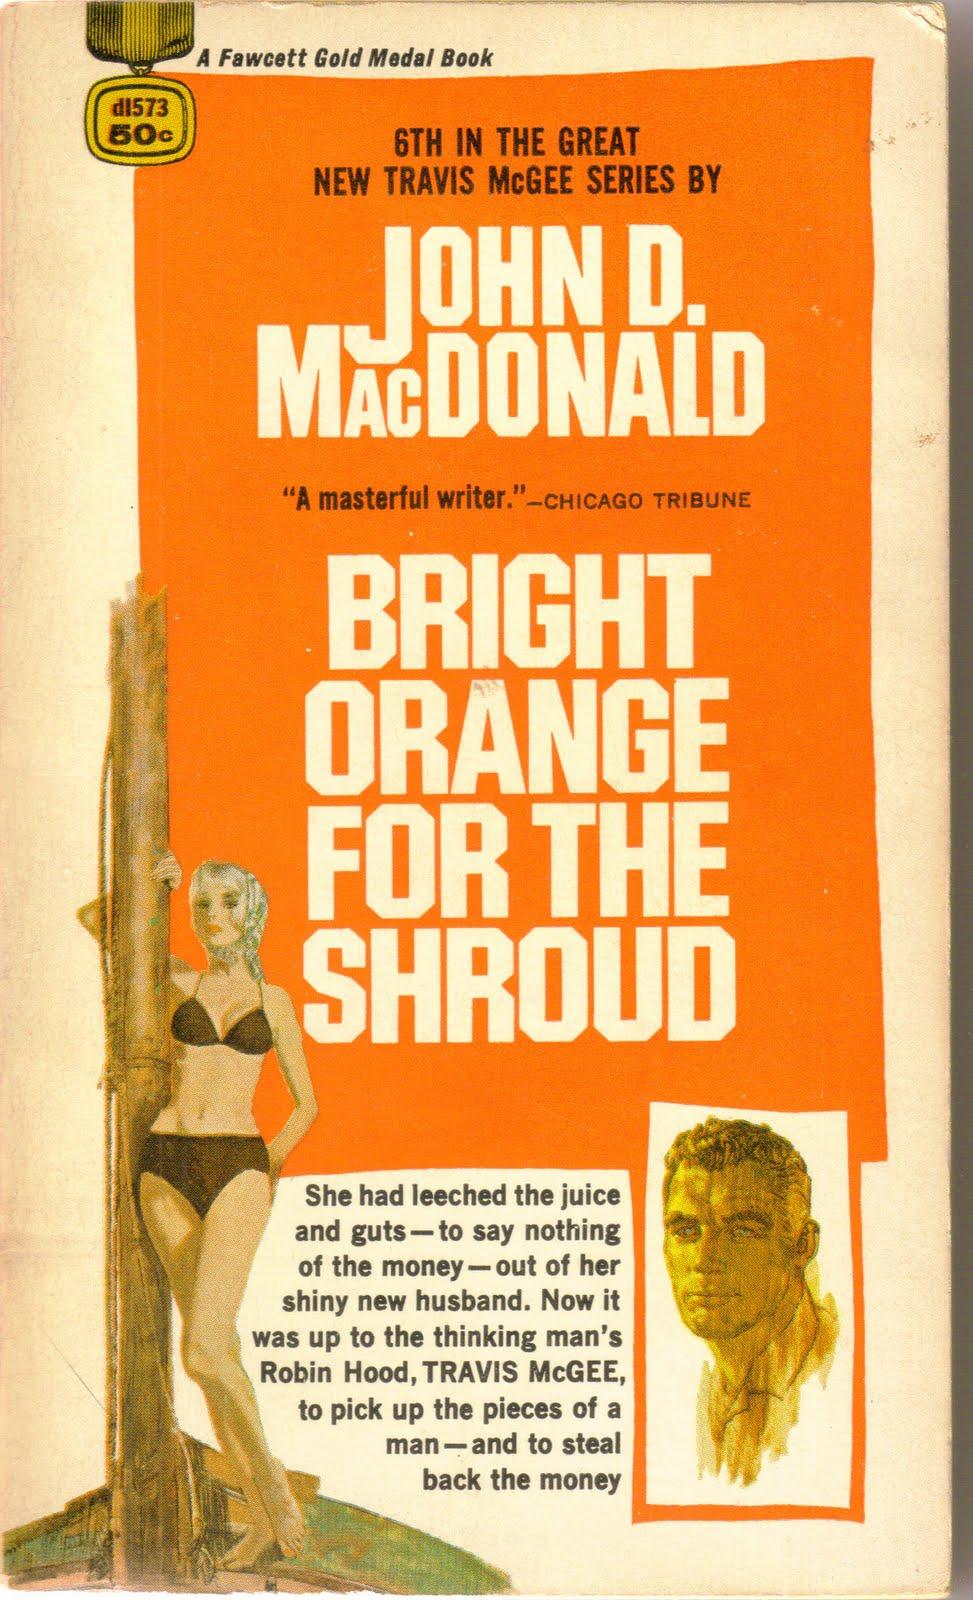 Travis McGee 06 - Bright Orange for the Shroud - John D. MacDonald